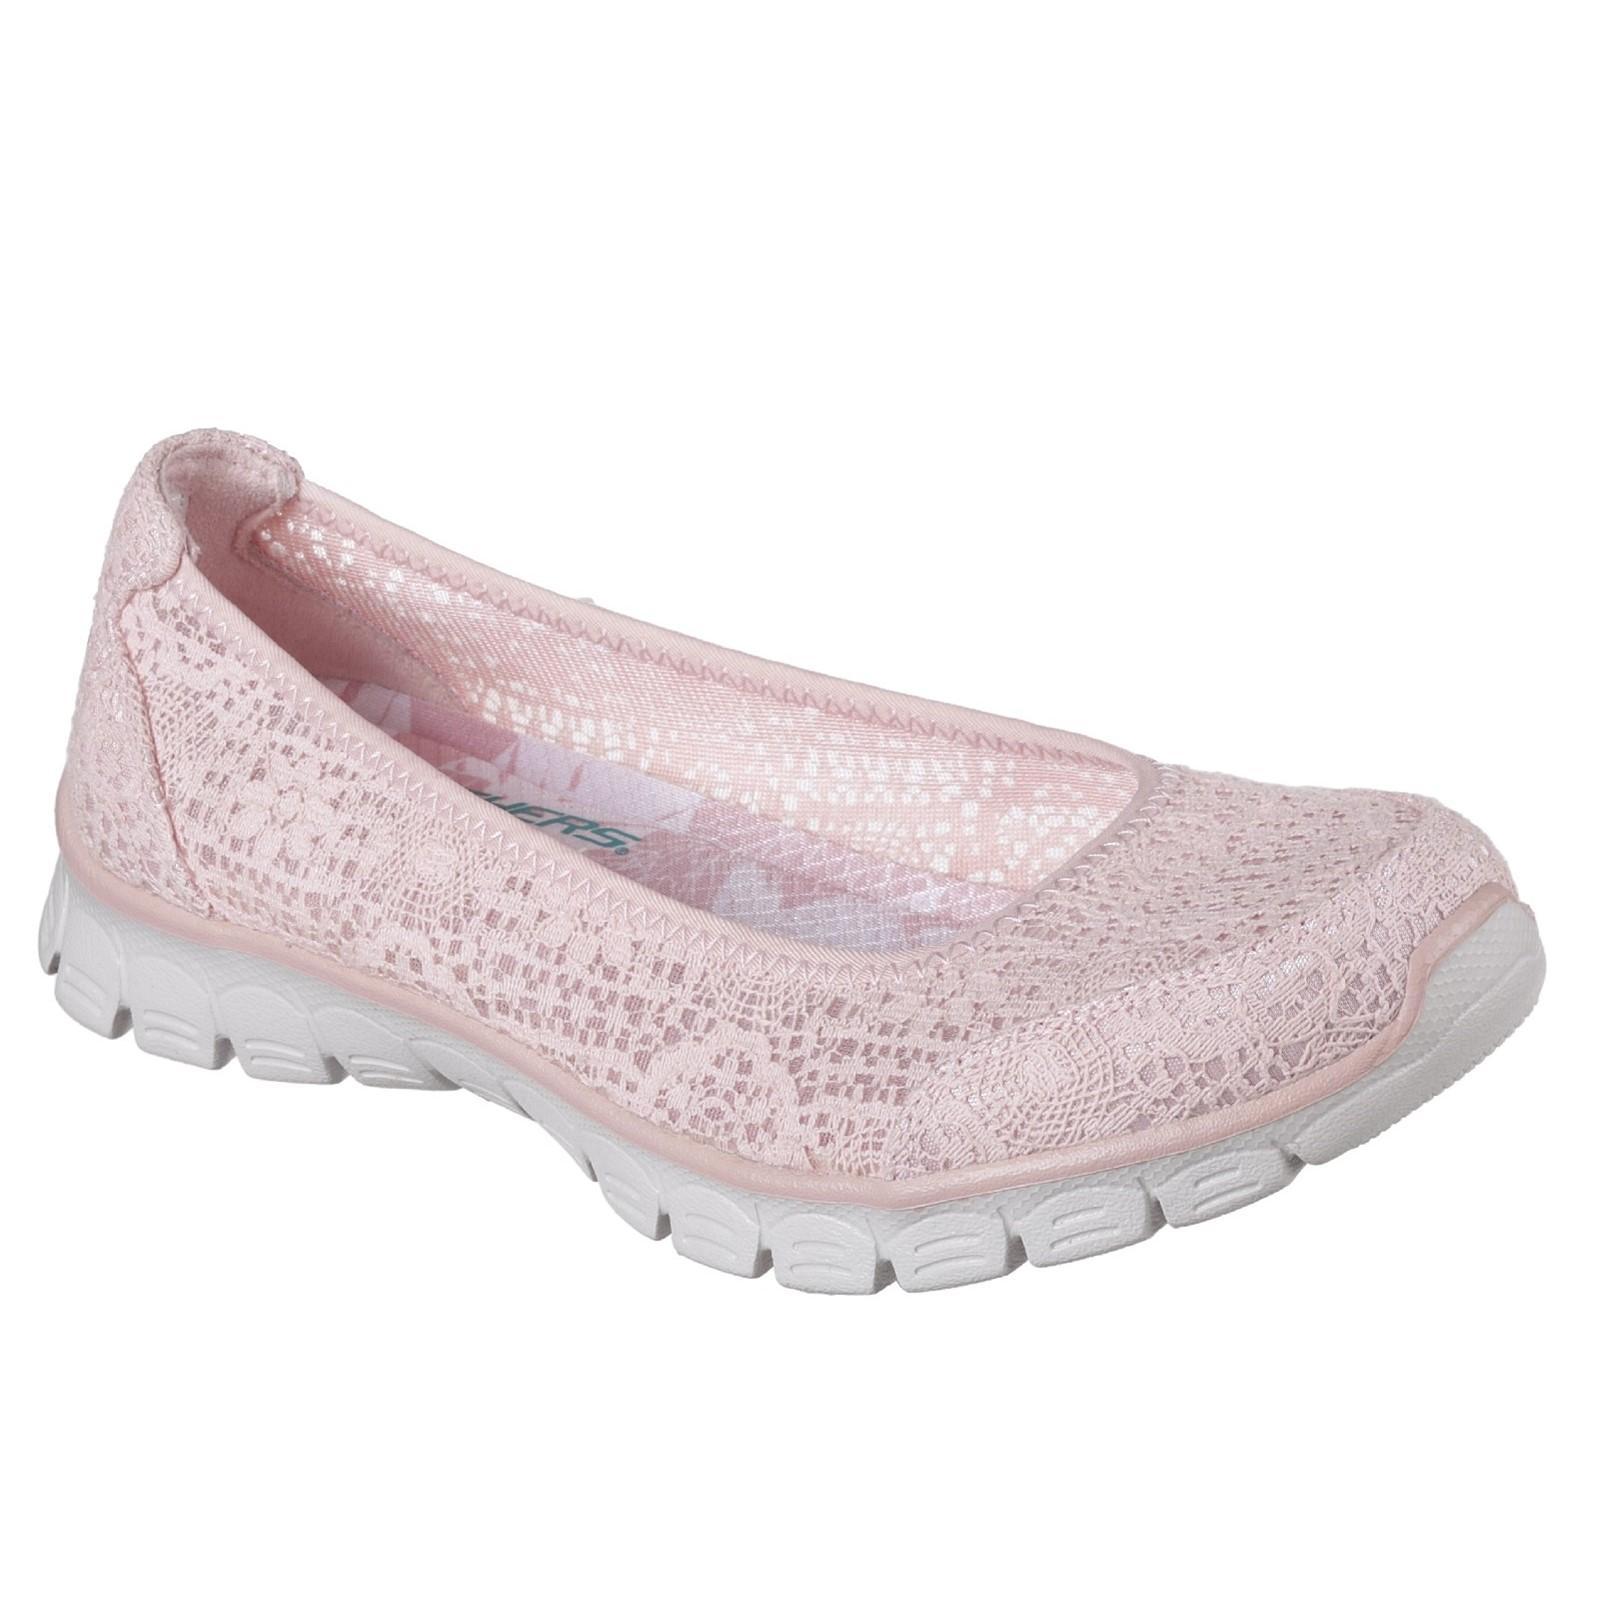 Skechers - EZ Flex 3.0 Beautify - Scarpe estive estive estive - Donna (FS5294) 3b4f5f